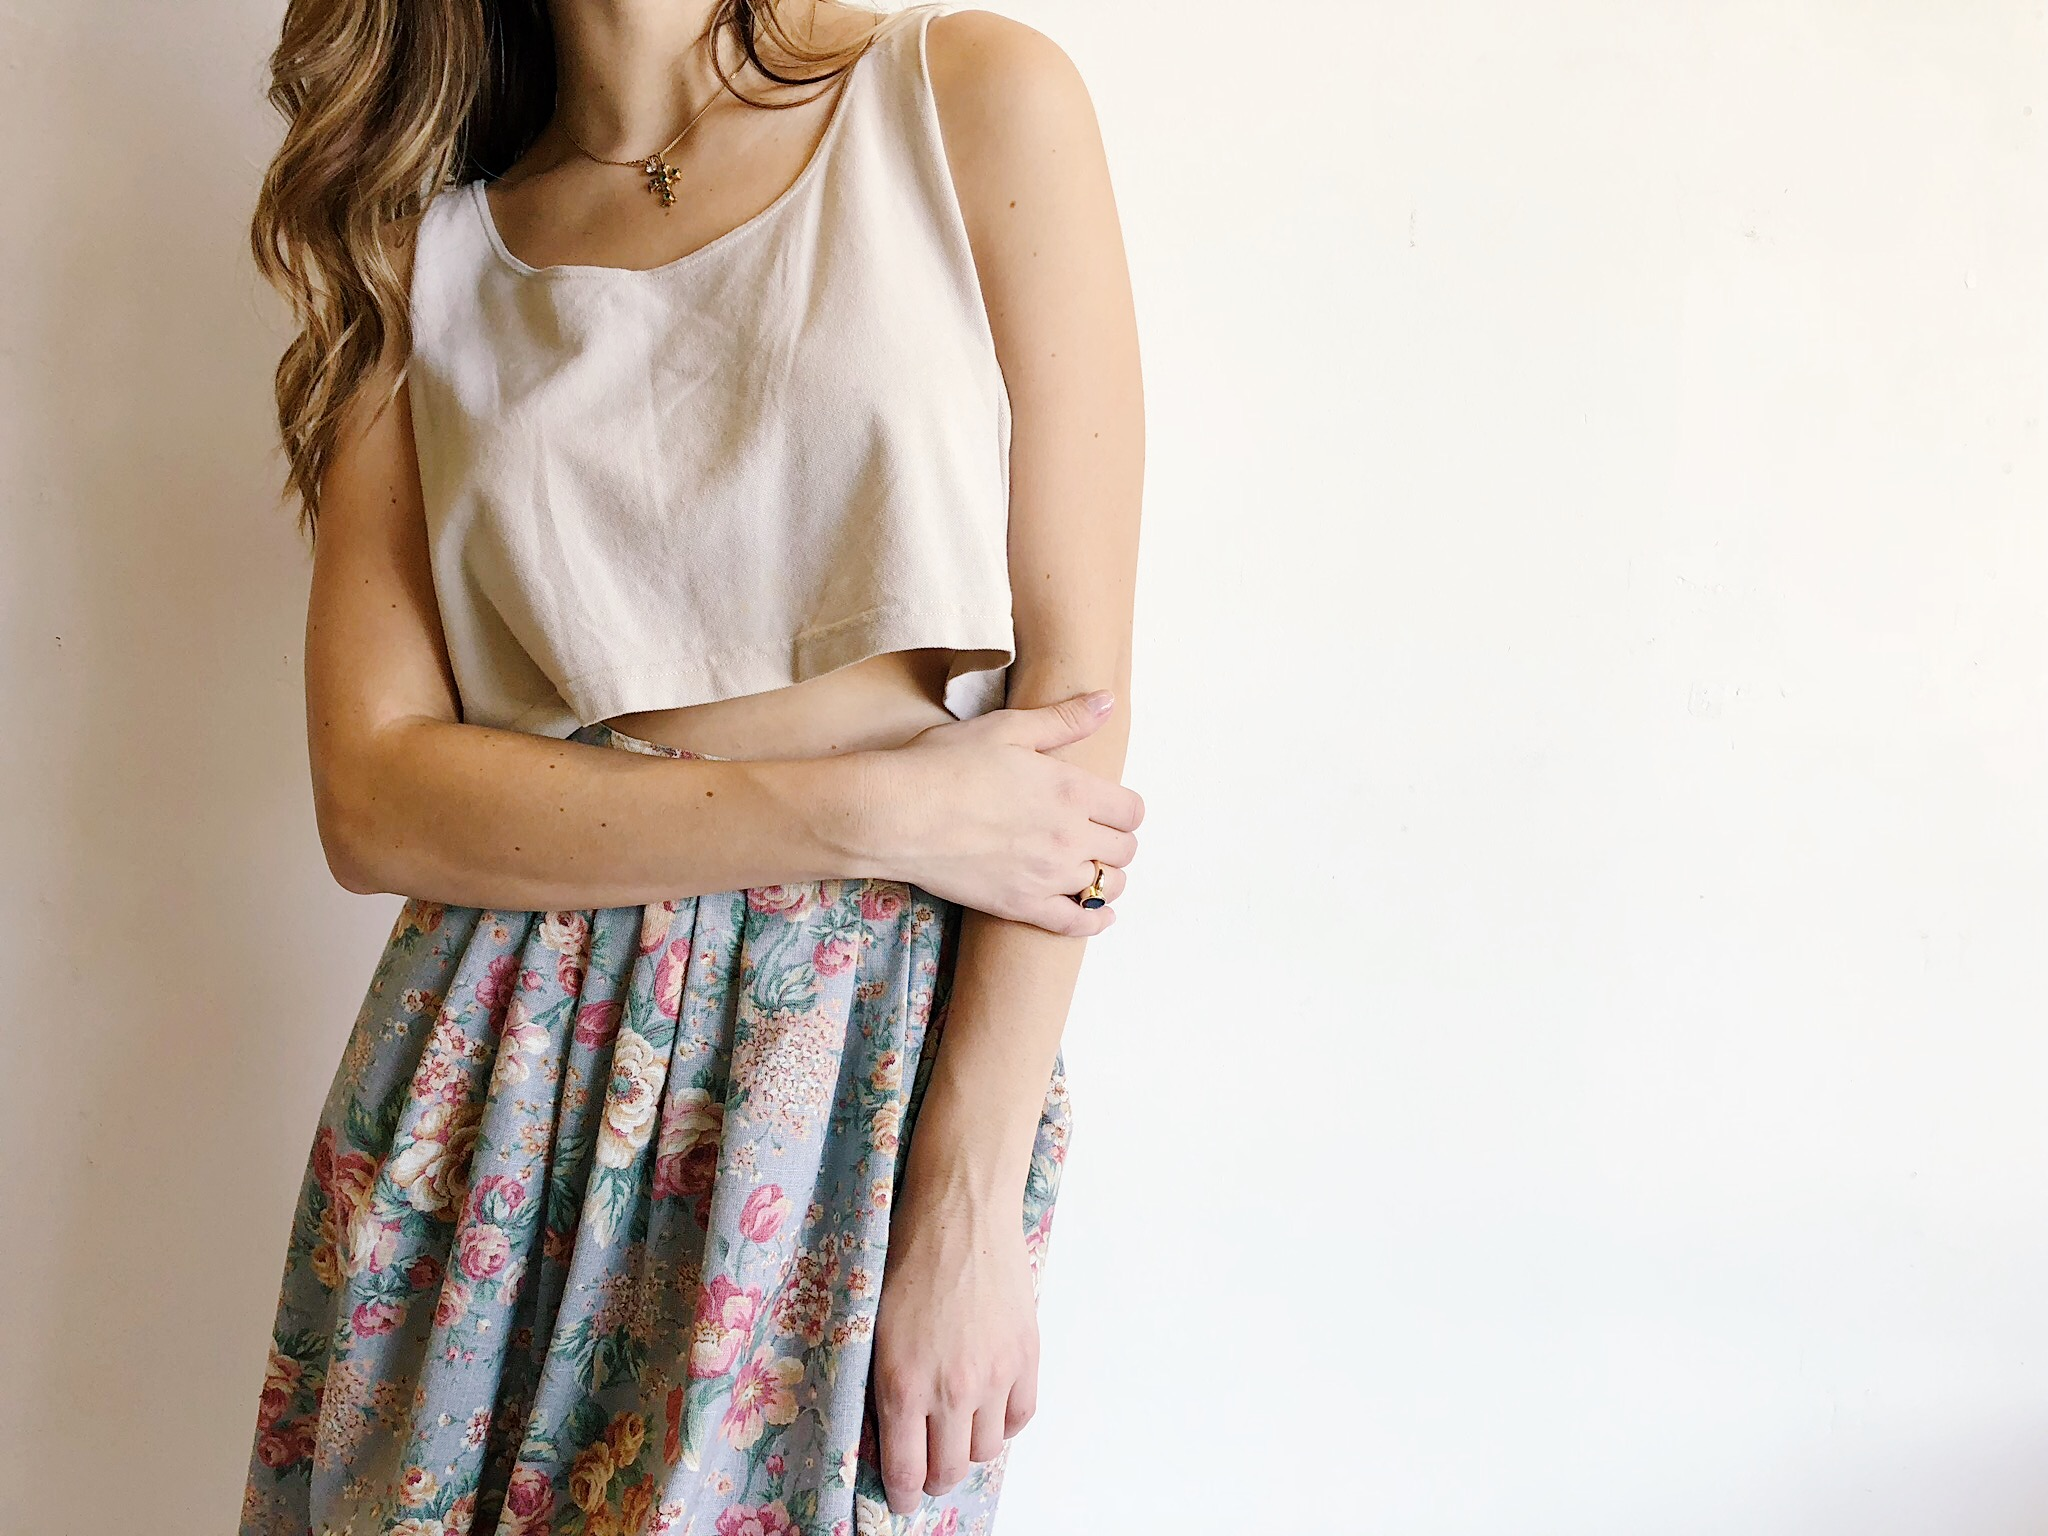 80s 90s Muted Floral Midi Skirt Wonsaponatime Vintage